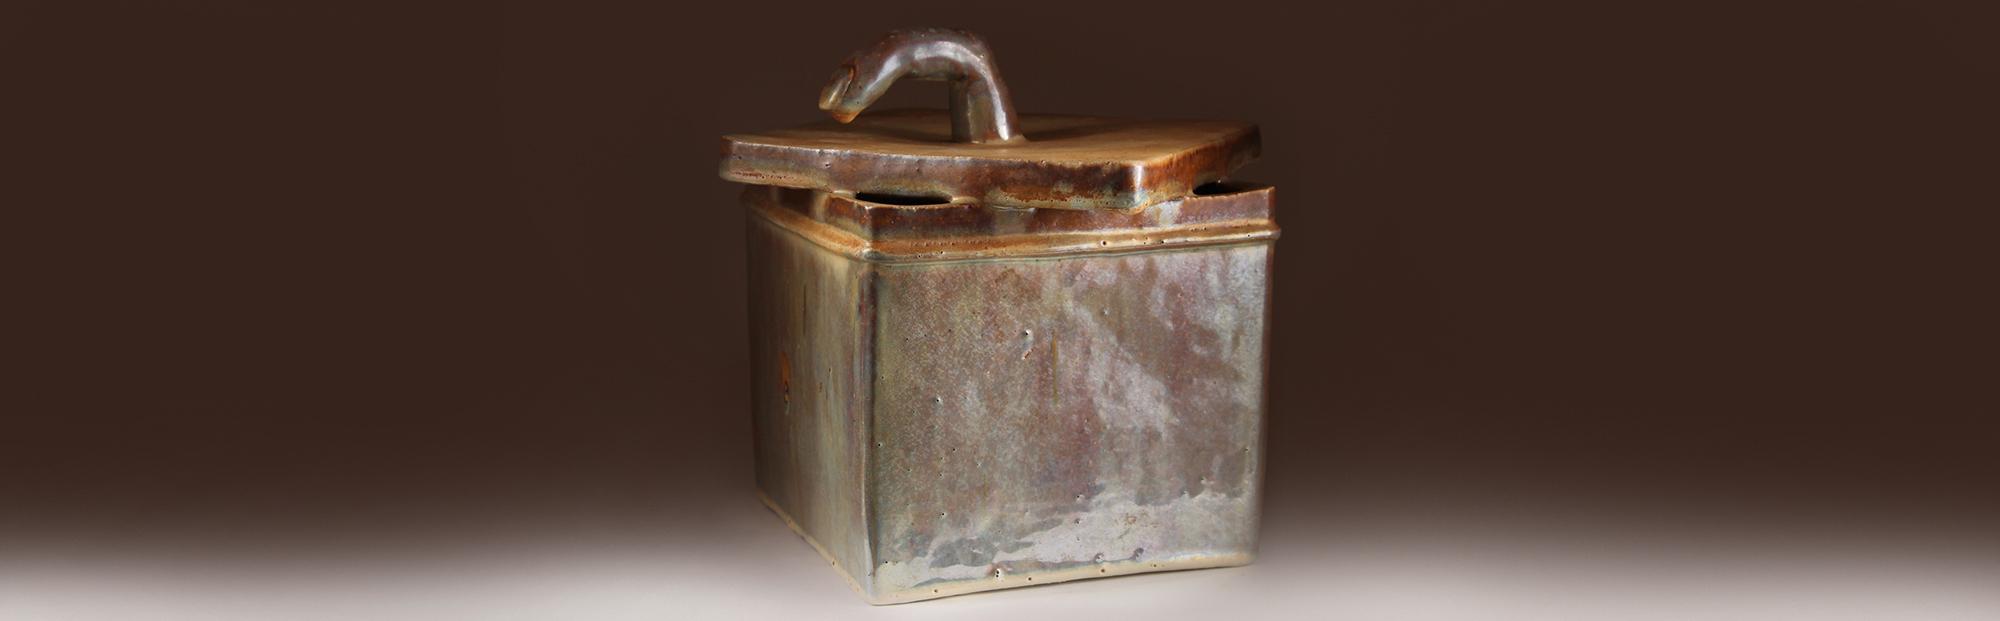 Japanese Ceramics and Works of Art: Edo Period to Modern